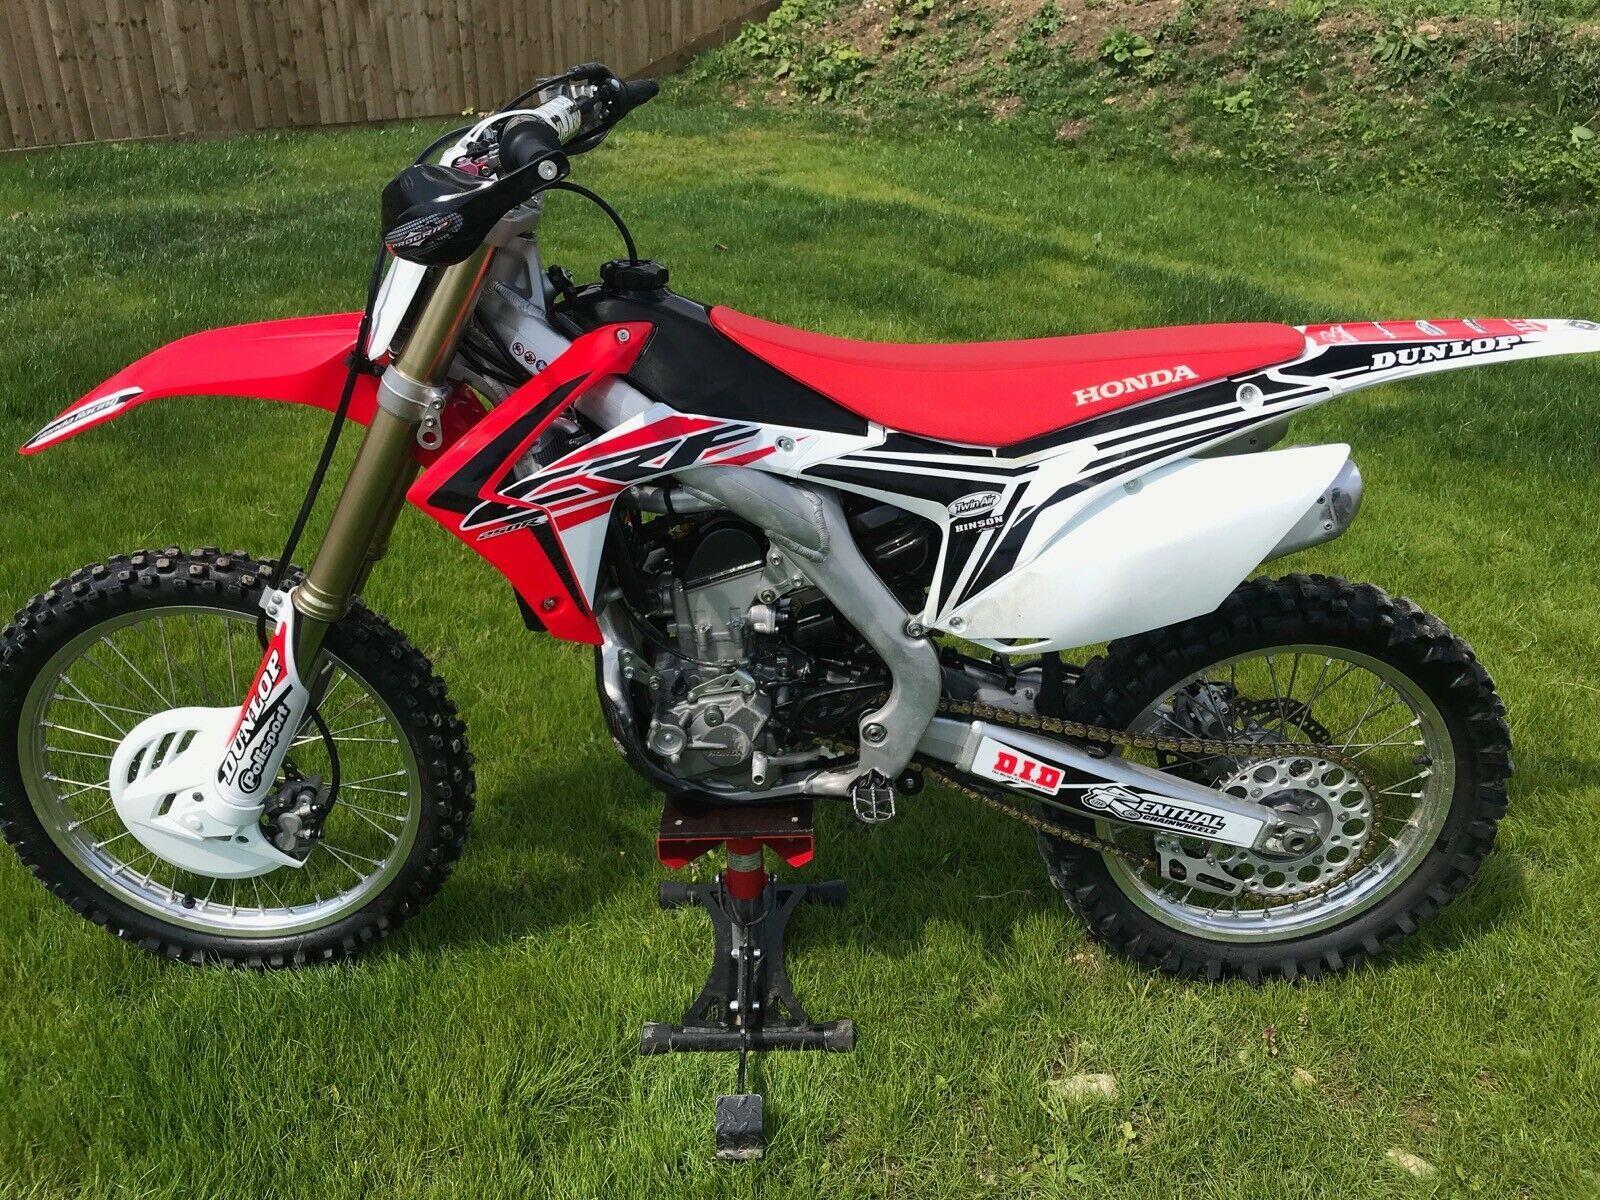 Honda Crf 250 2015 Low Hours Fuel Injection Mx Bike Motorcross